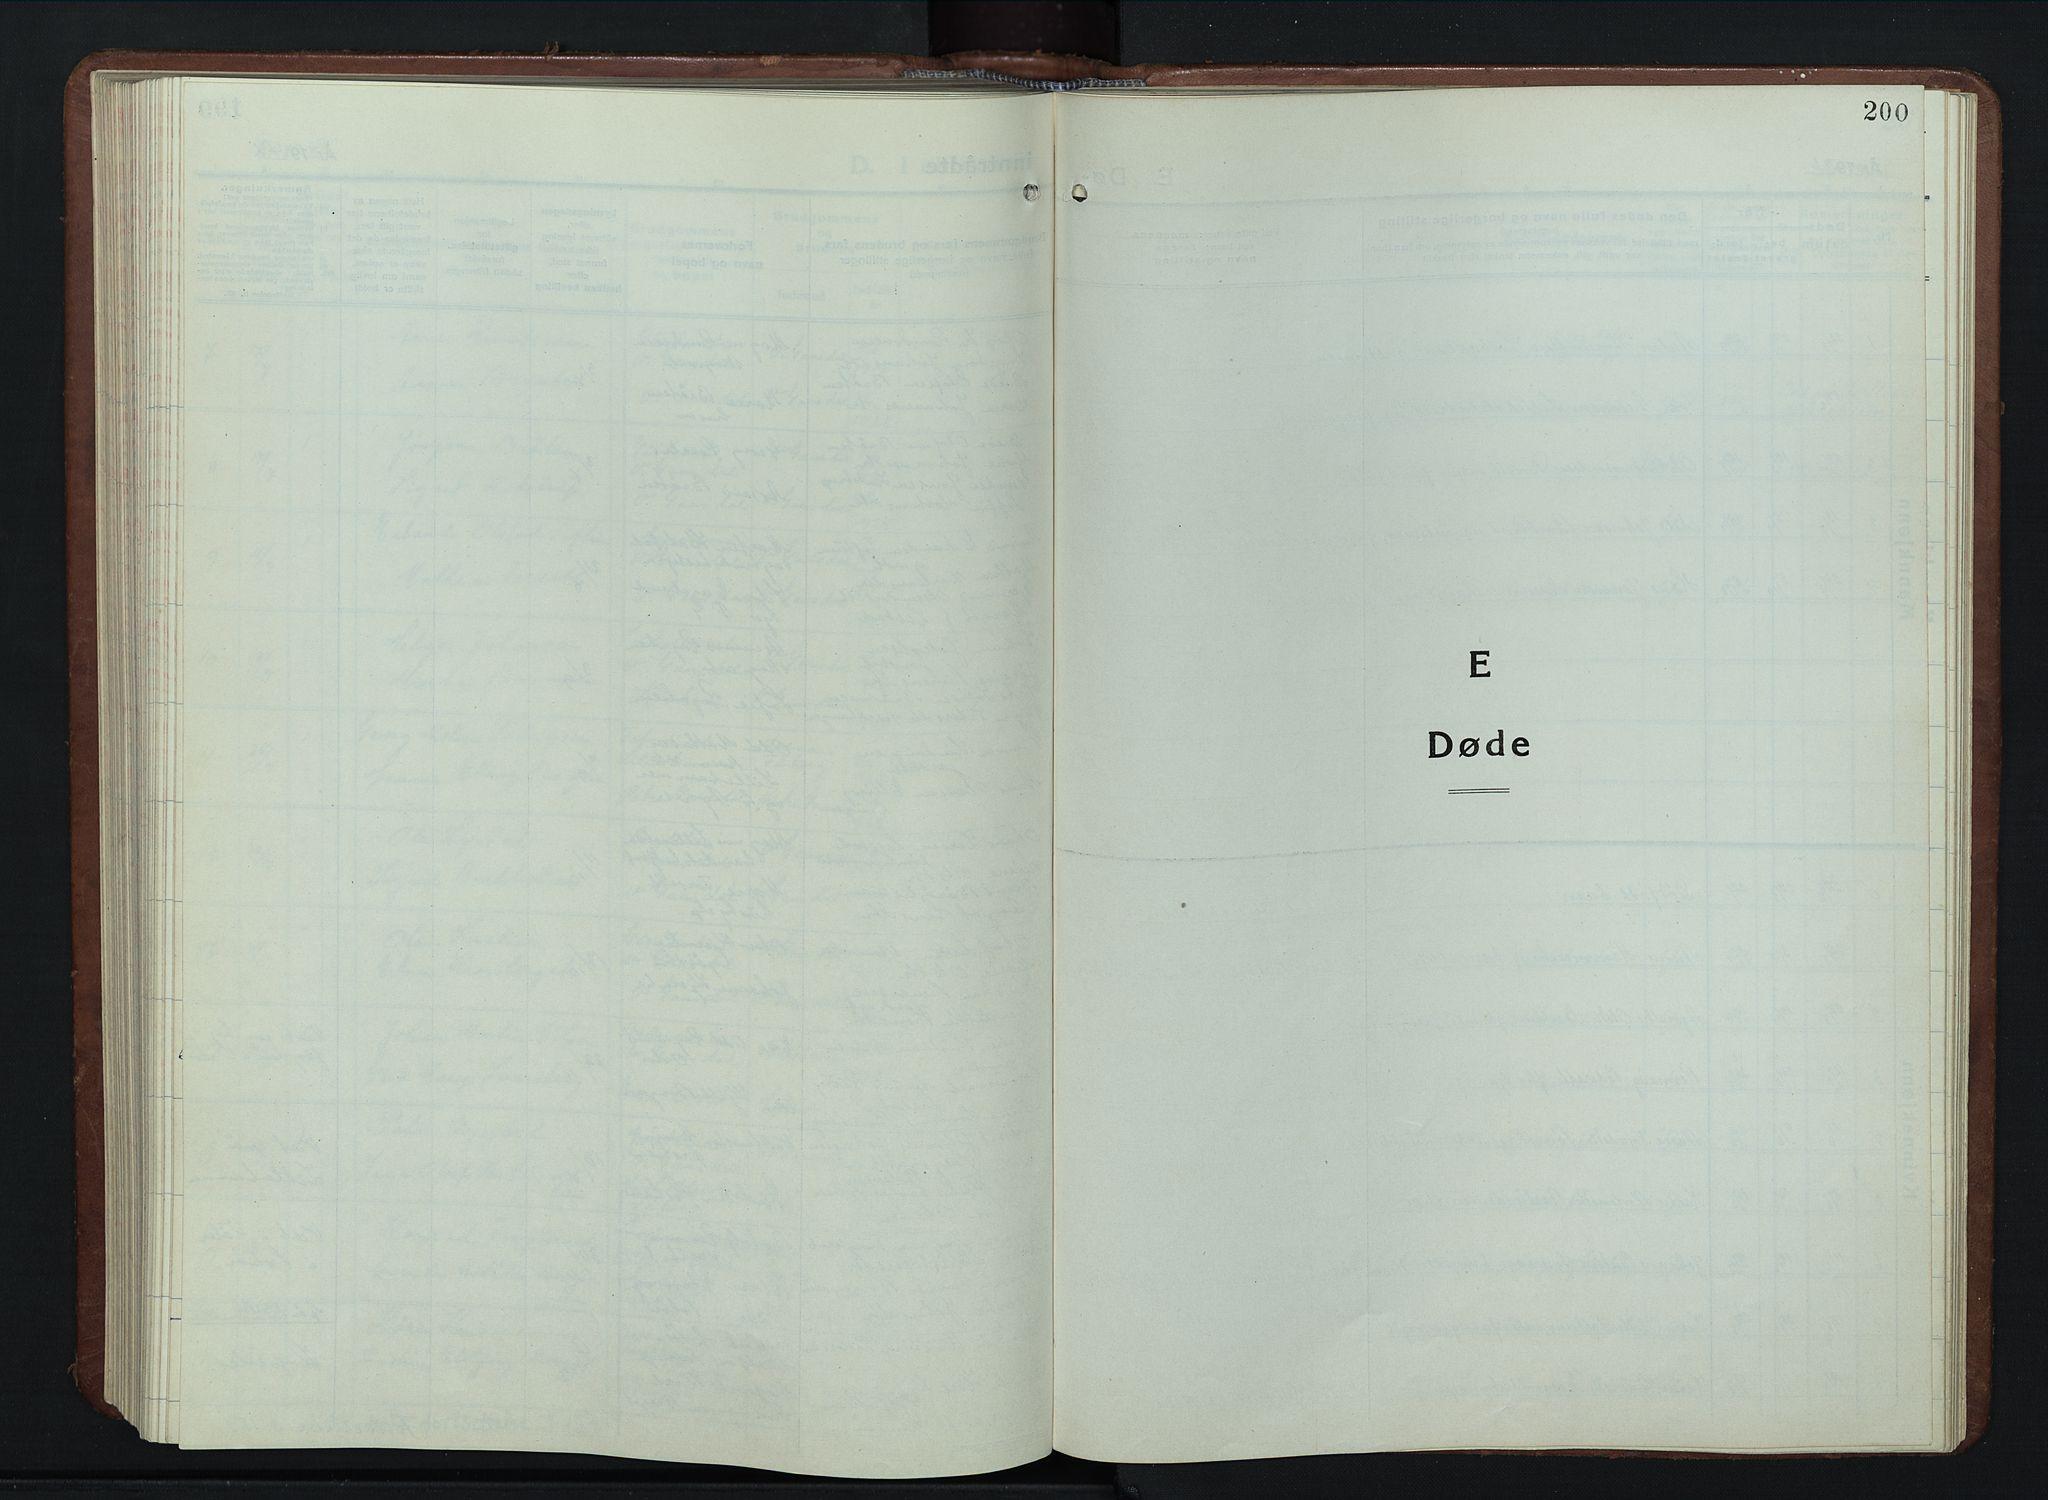 SAH, Vestre Gausdal prestekontor, Parish register (copy) no. 5, 1926-1955, p. 200